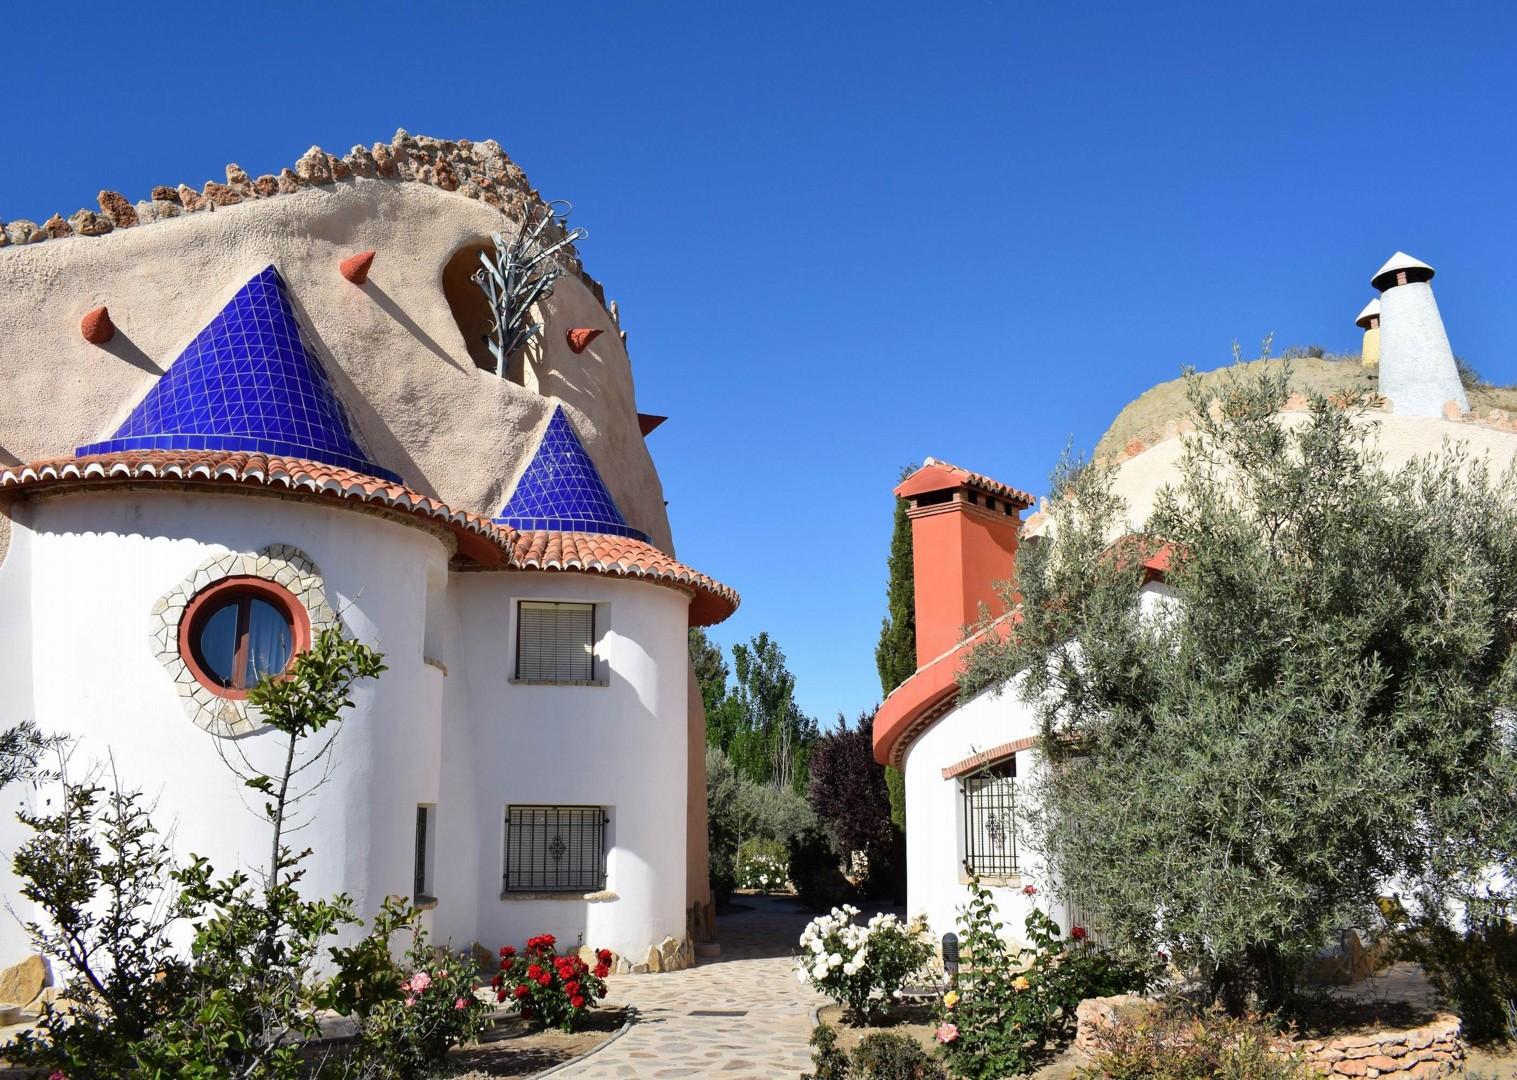 _Customer.145622.33949.jpg - Southern Spain - Sierra Nevada and Granada - Guided Road Cycling Holiday - Road Cycling